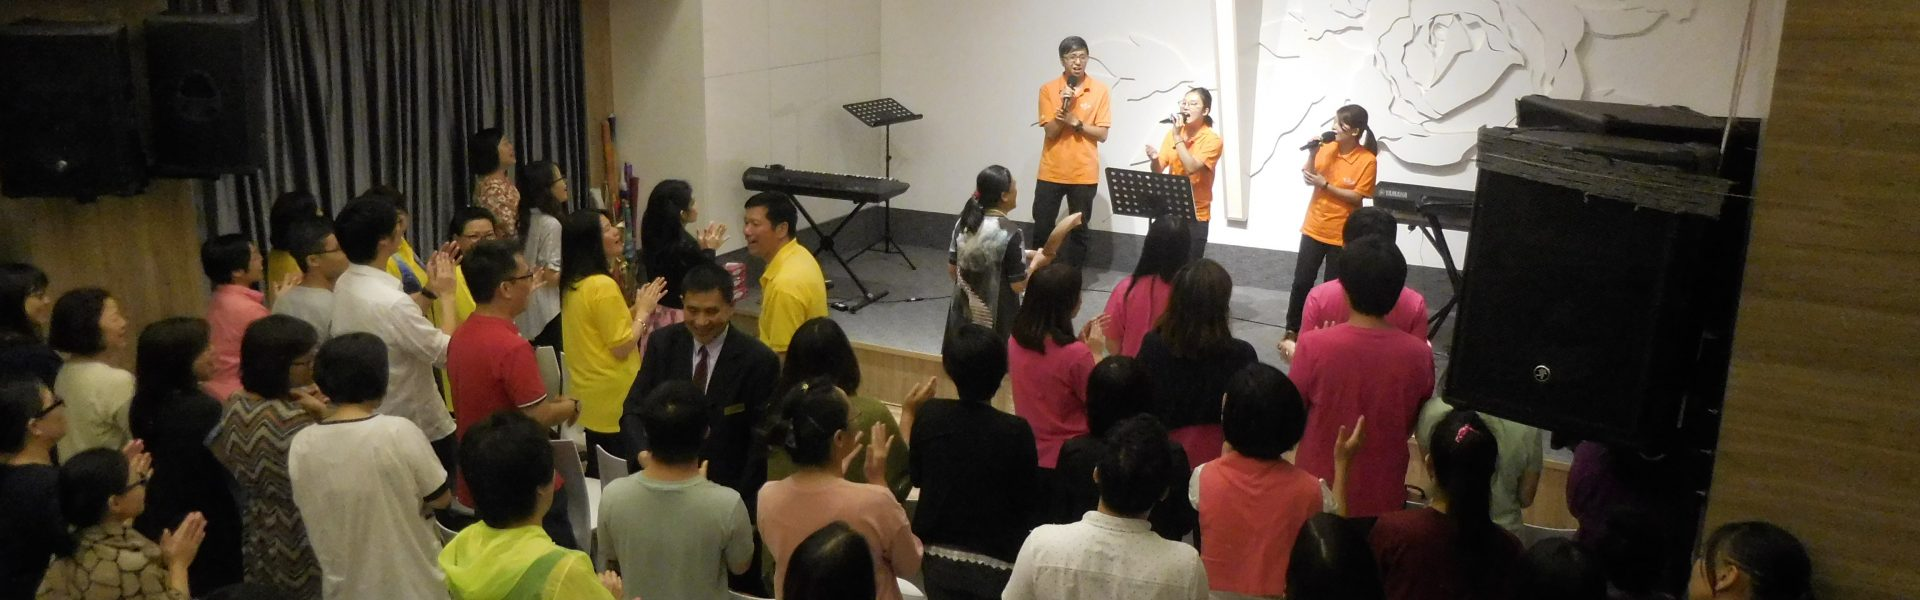 <a href=' http://tmbc.org.hk/教會介紹/聚會時間/ '>同心敬拜</a>